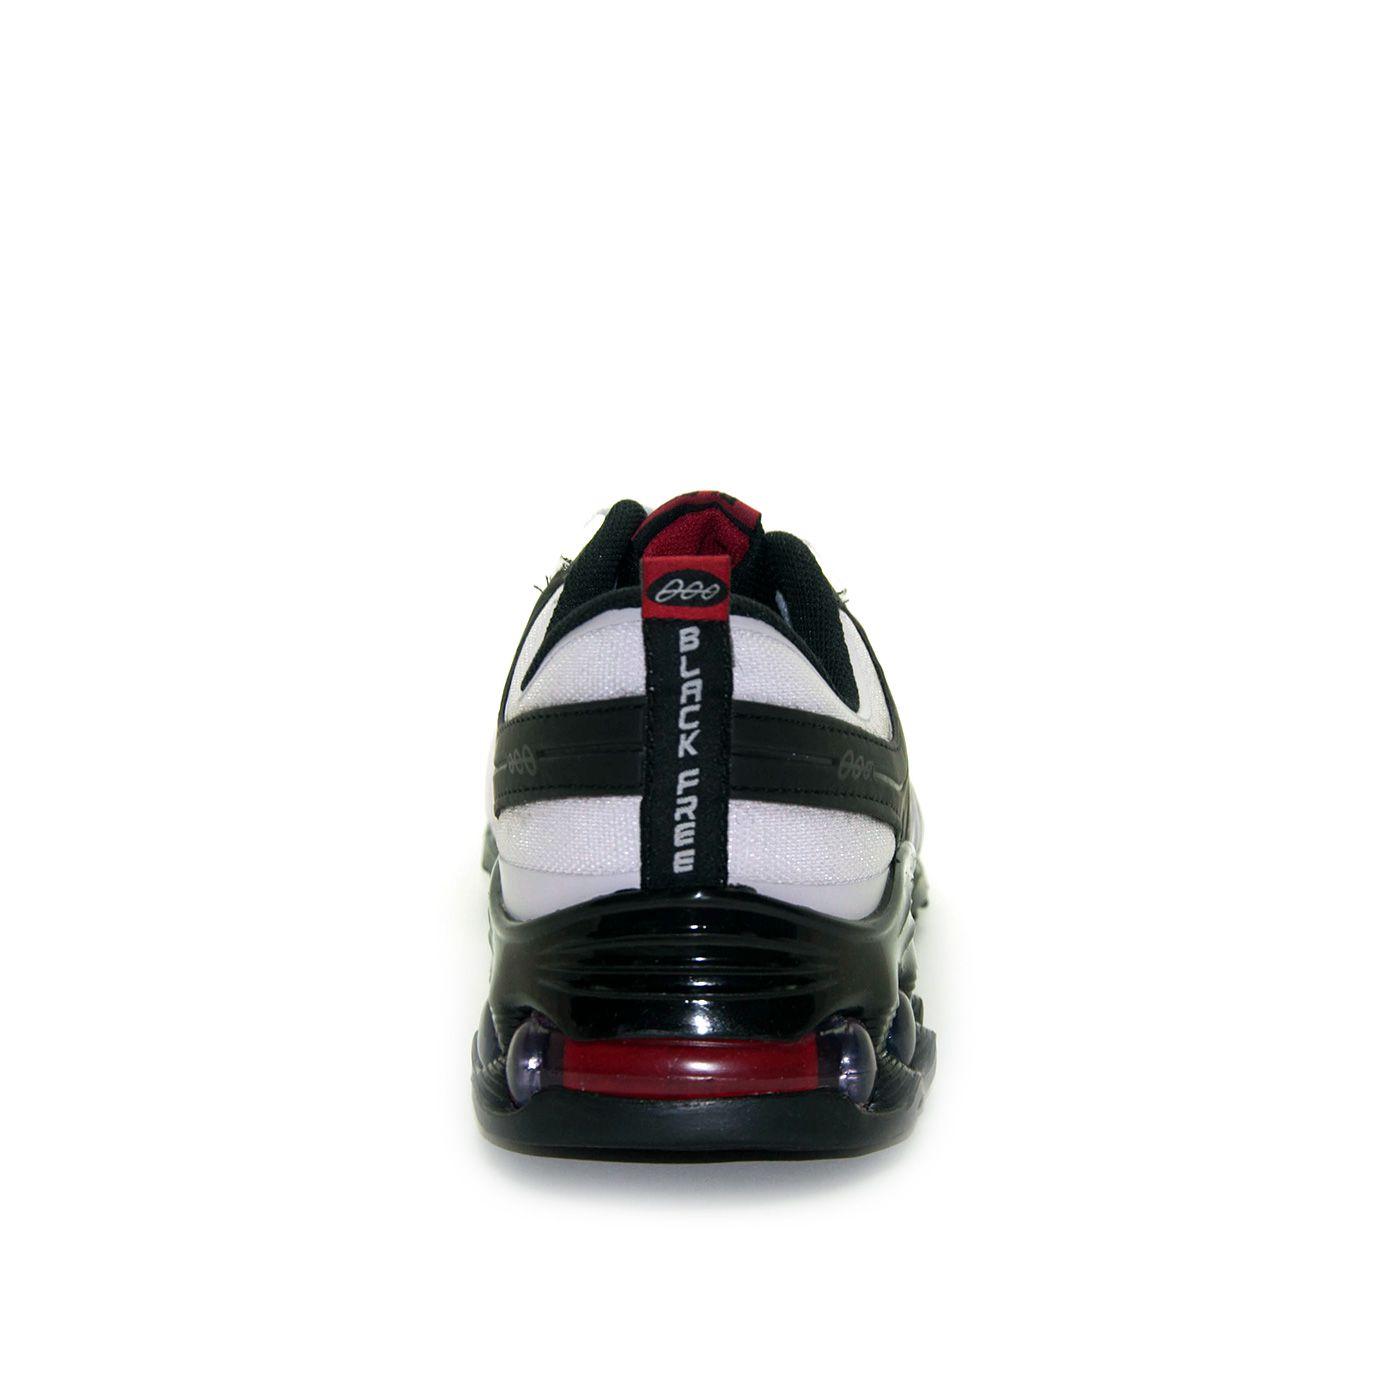 TENIS BLACK FREE AIR BLACK 370 - 57.800